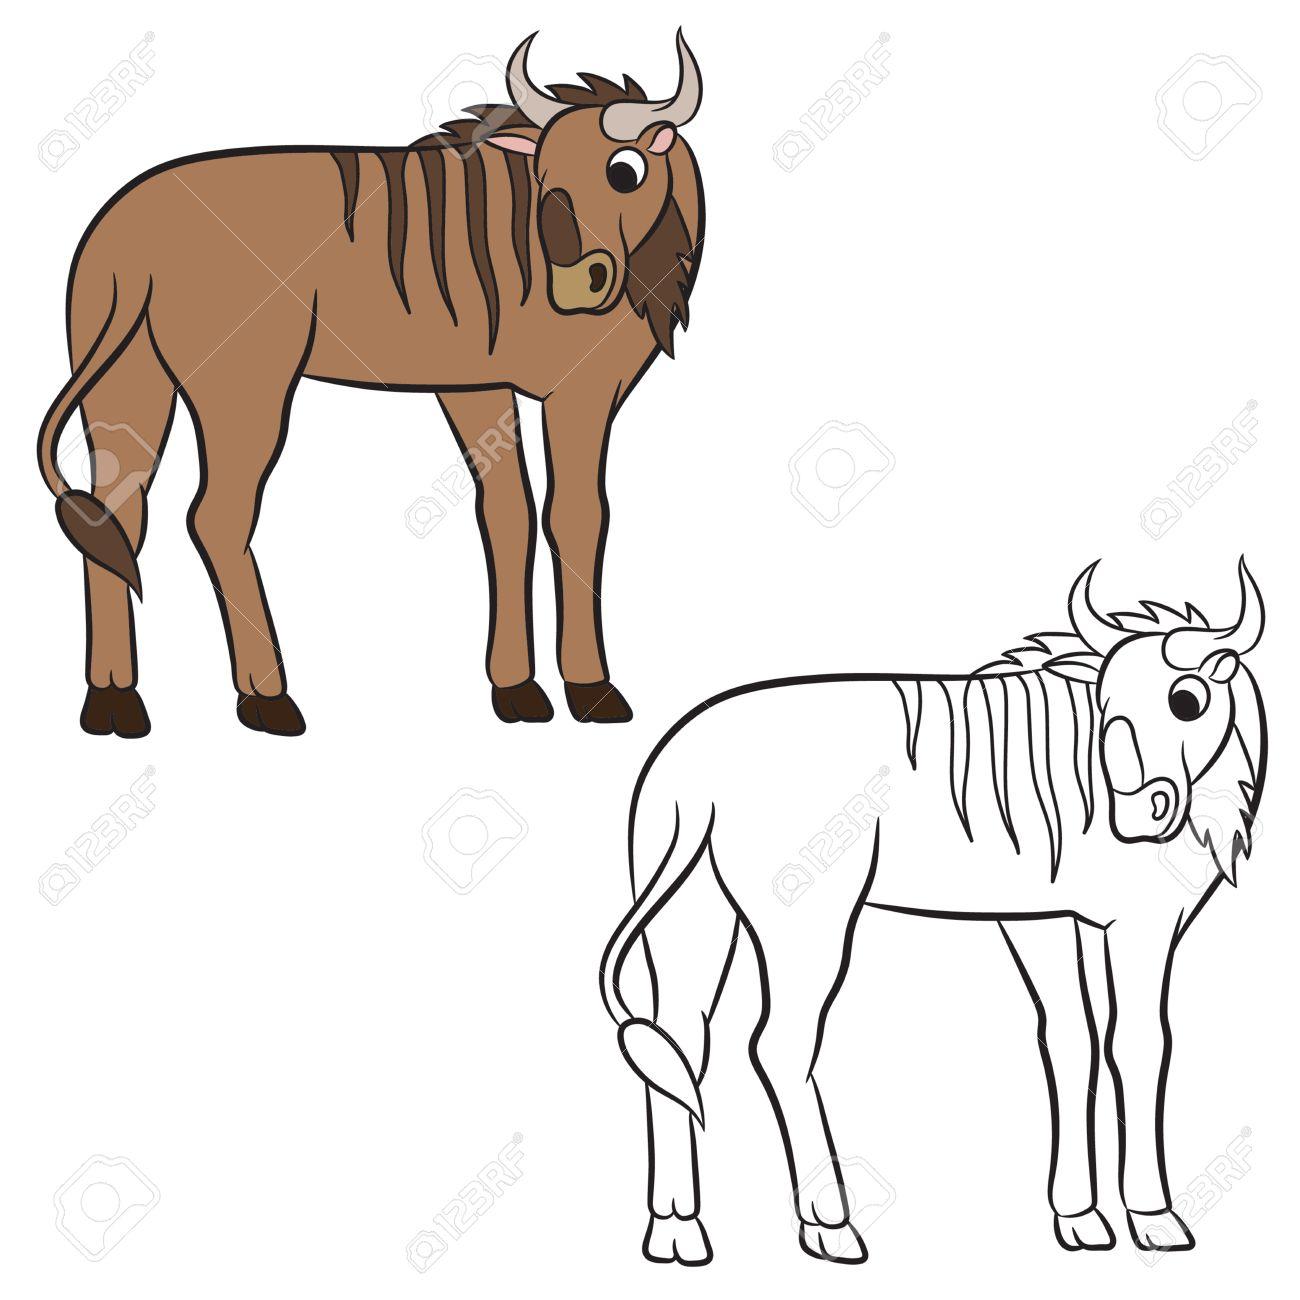 Wildebeest coloring #10, Download drawings